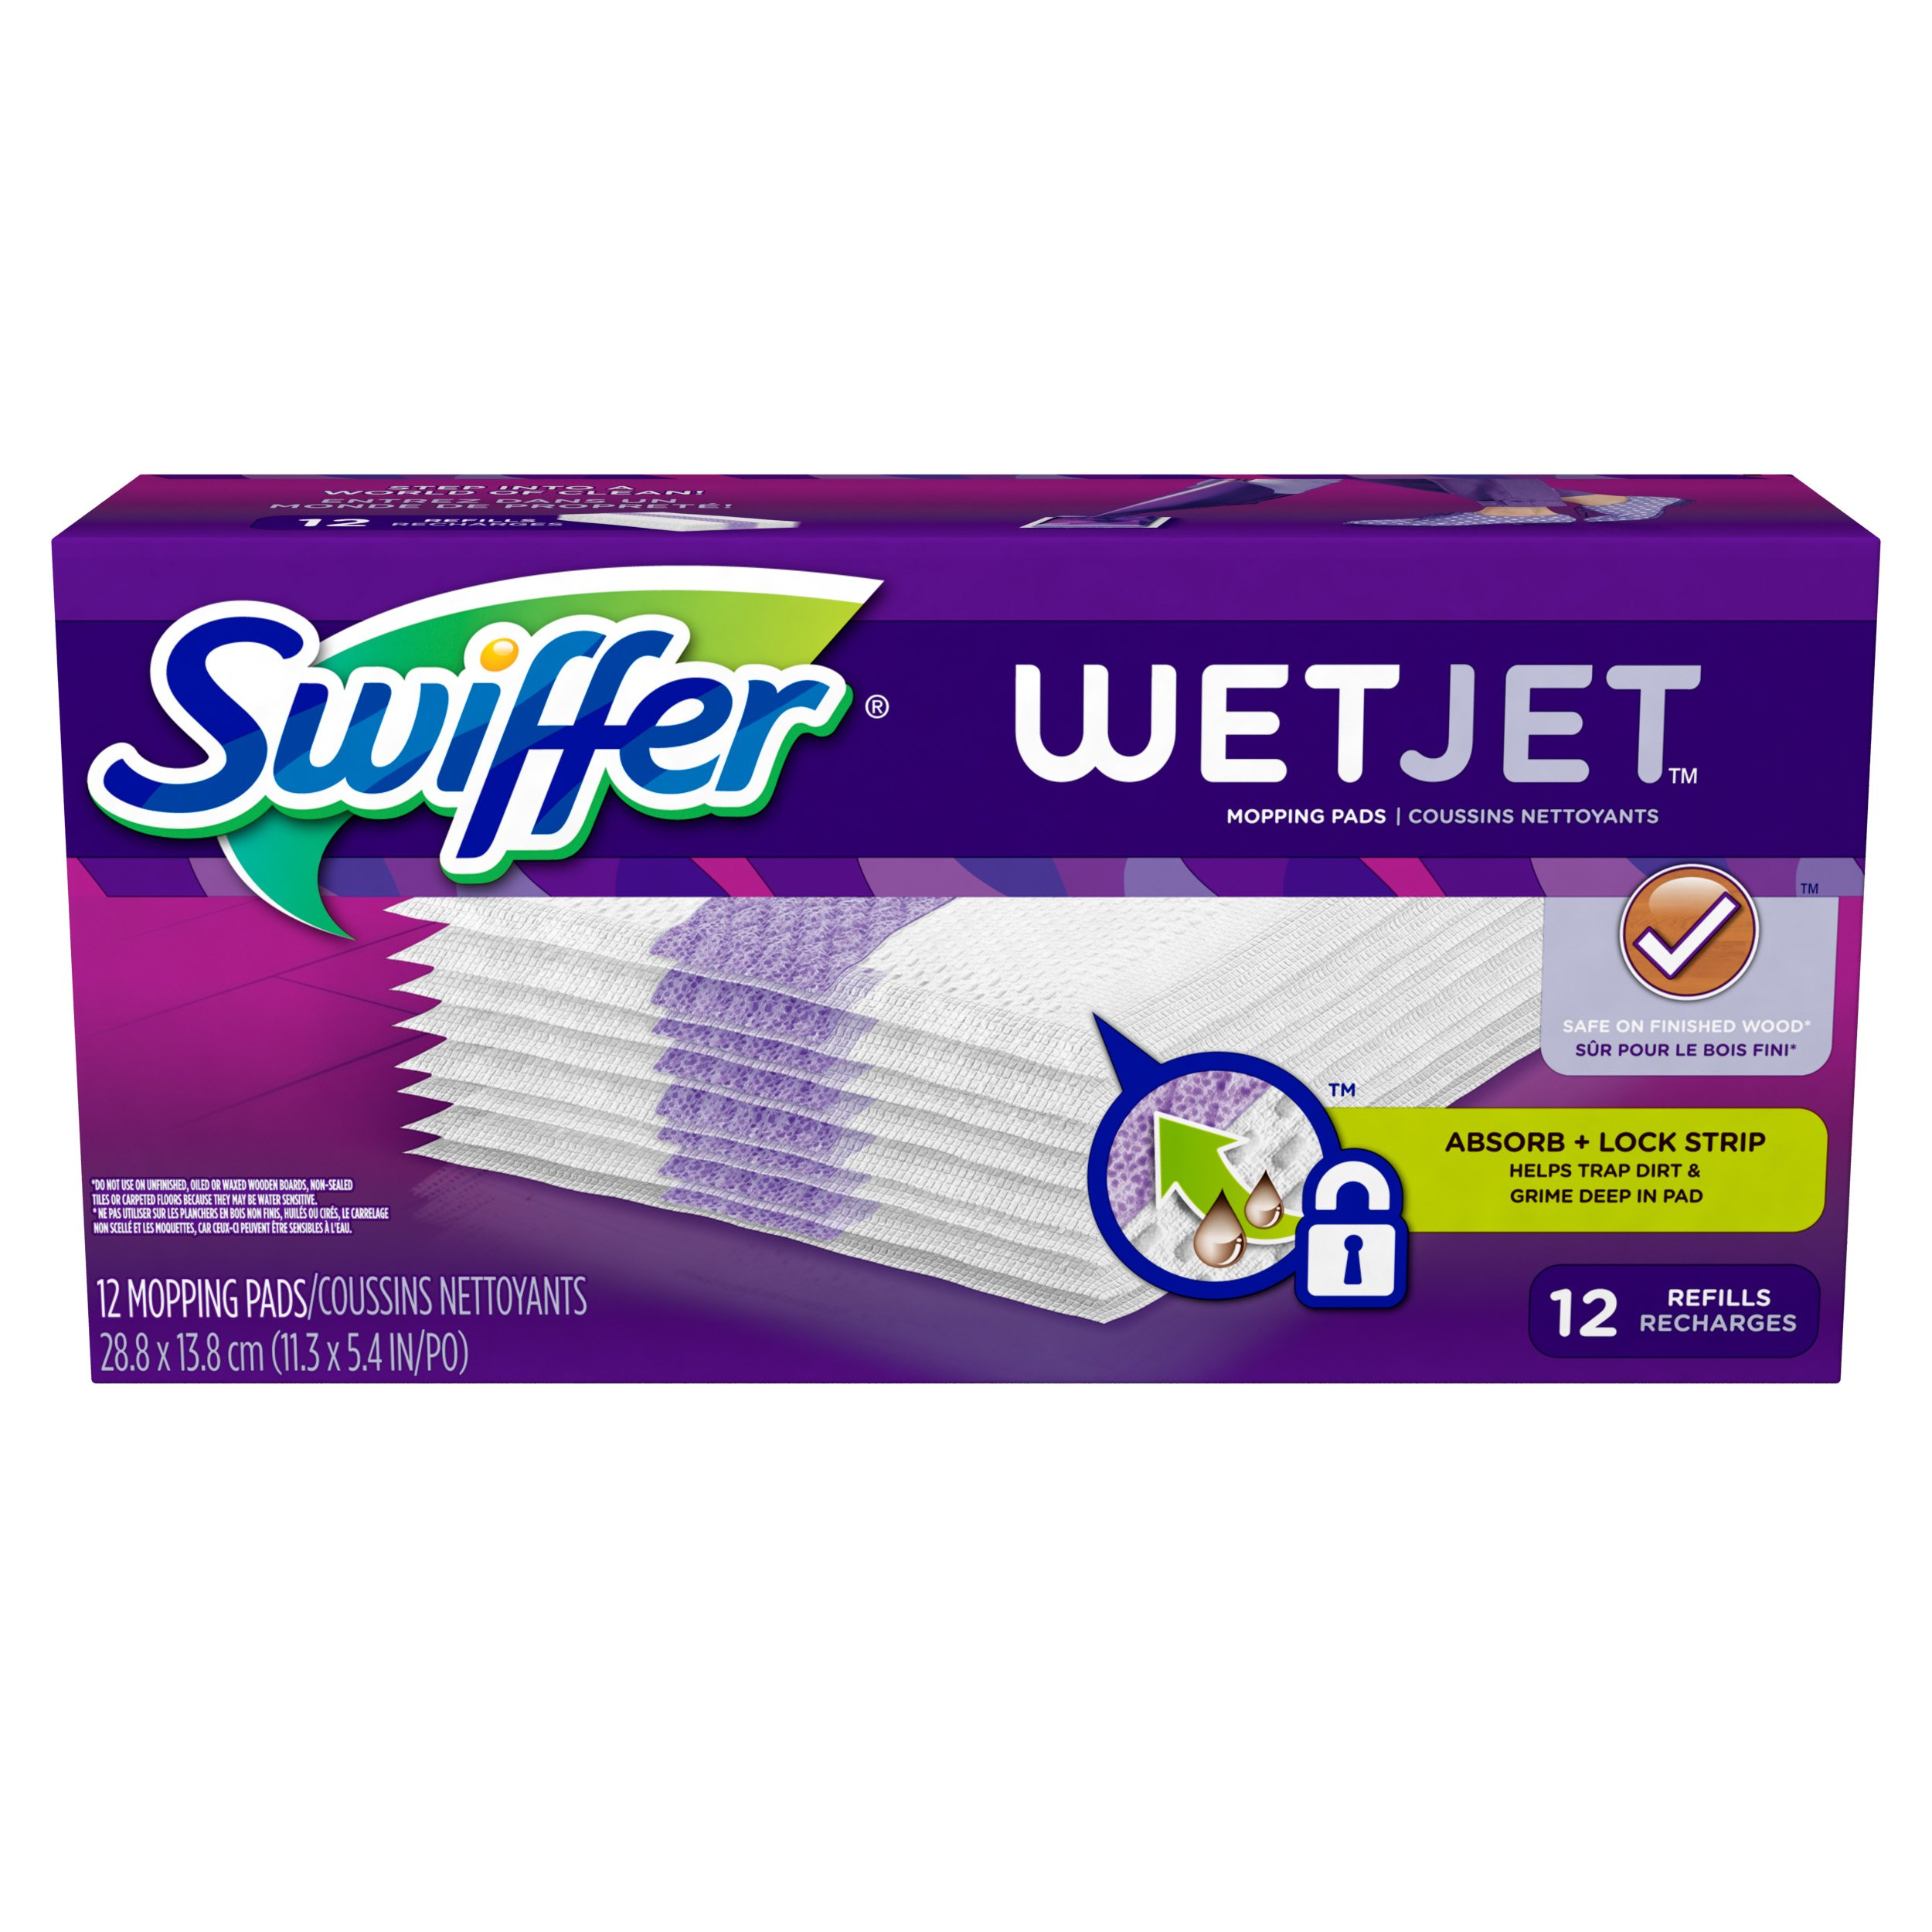 Swiffer<sup>&reg;</sup> WetJet<sup>&reg;</sup> Original Refills Cleaning Pads